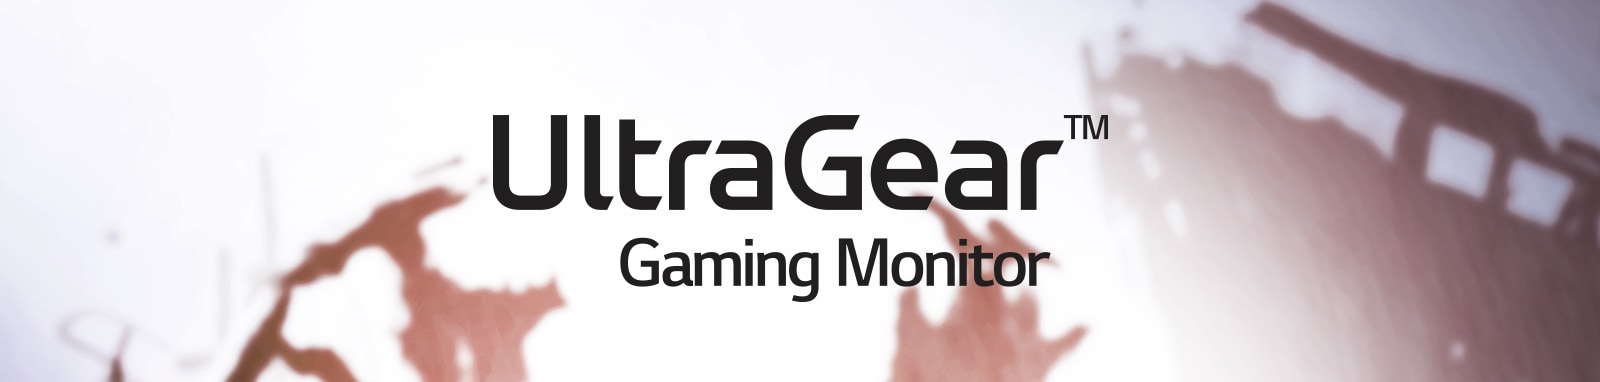 MNT-UltraGear-24GL600F-01-UltraGear-Desktop